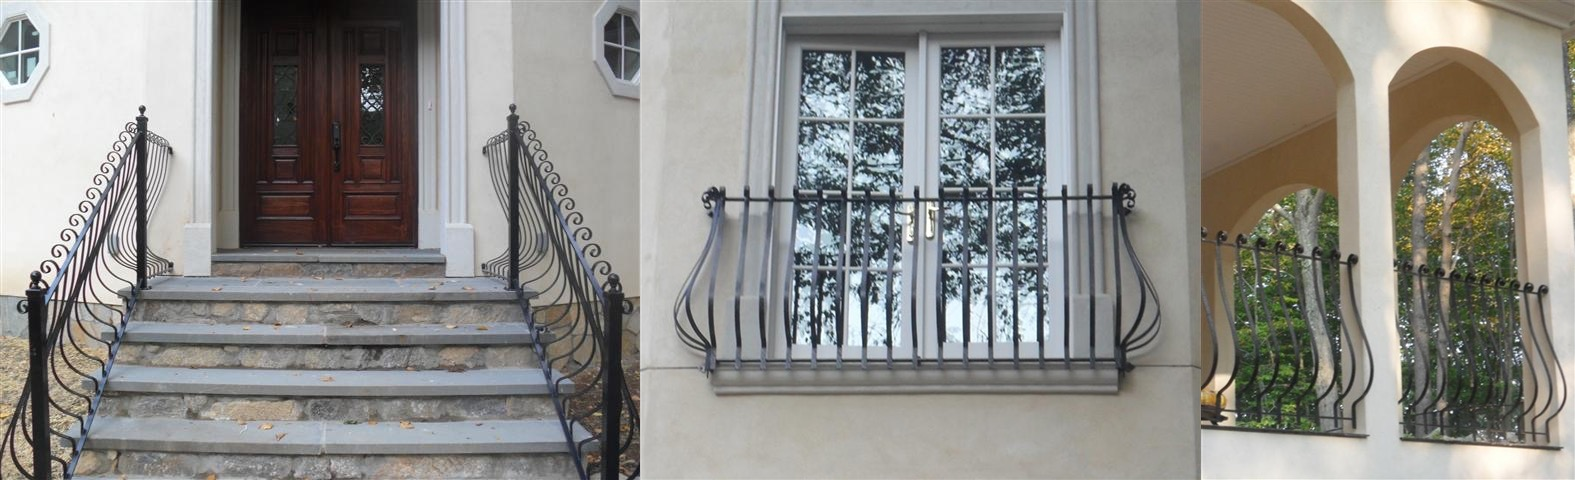 railings-goose-1.jpg